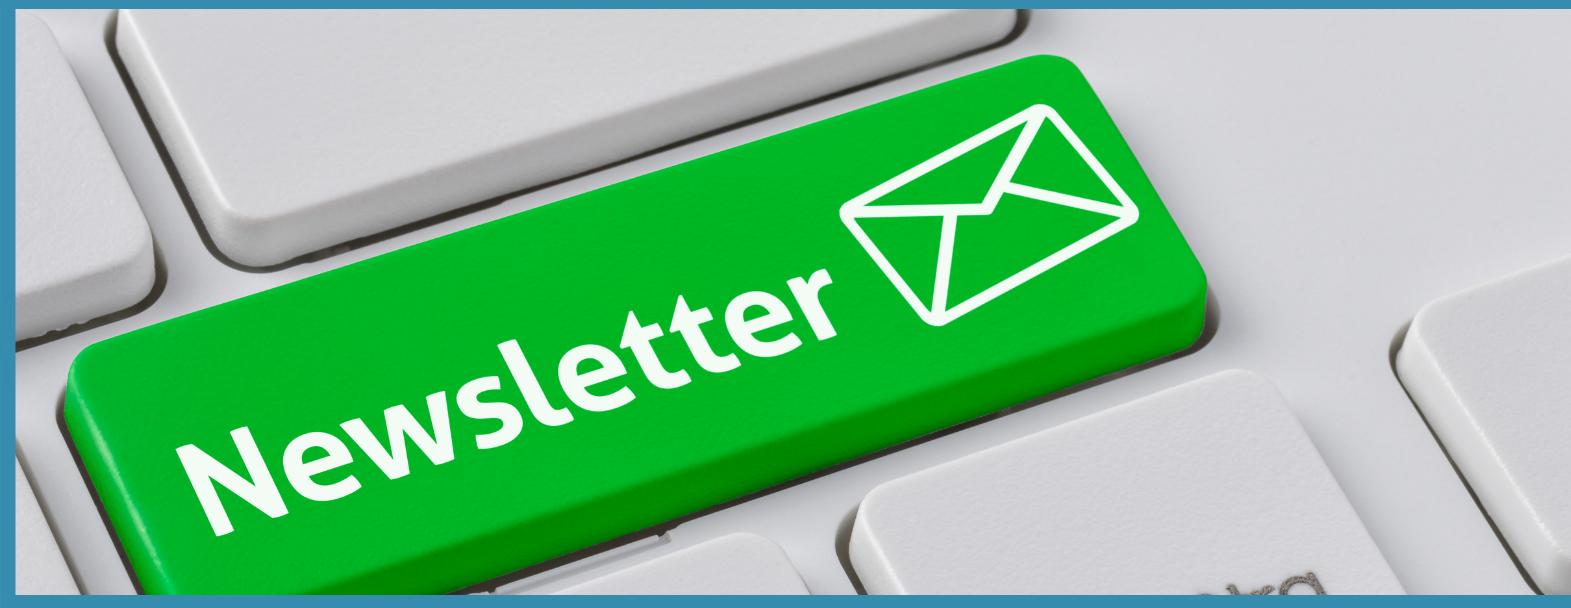 Copy of NOA newsletter sign up EDIT